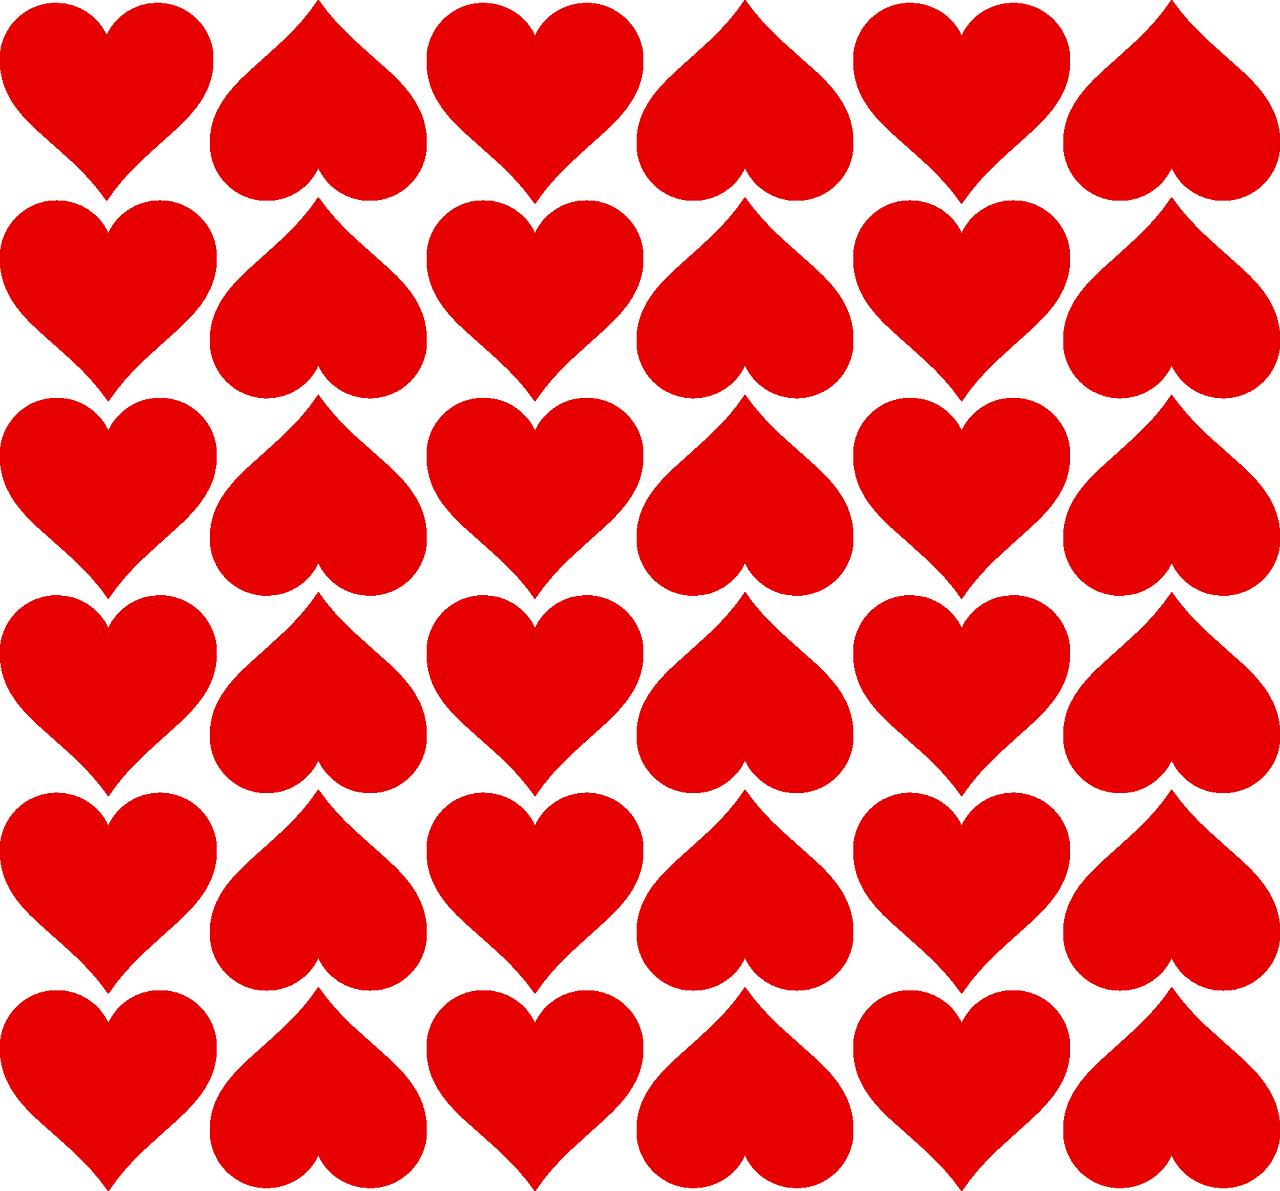 Валентинки, шаблон картинки с сердечками